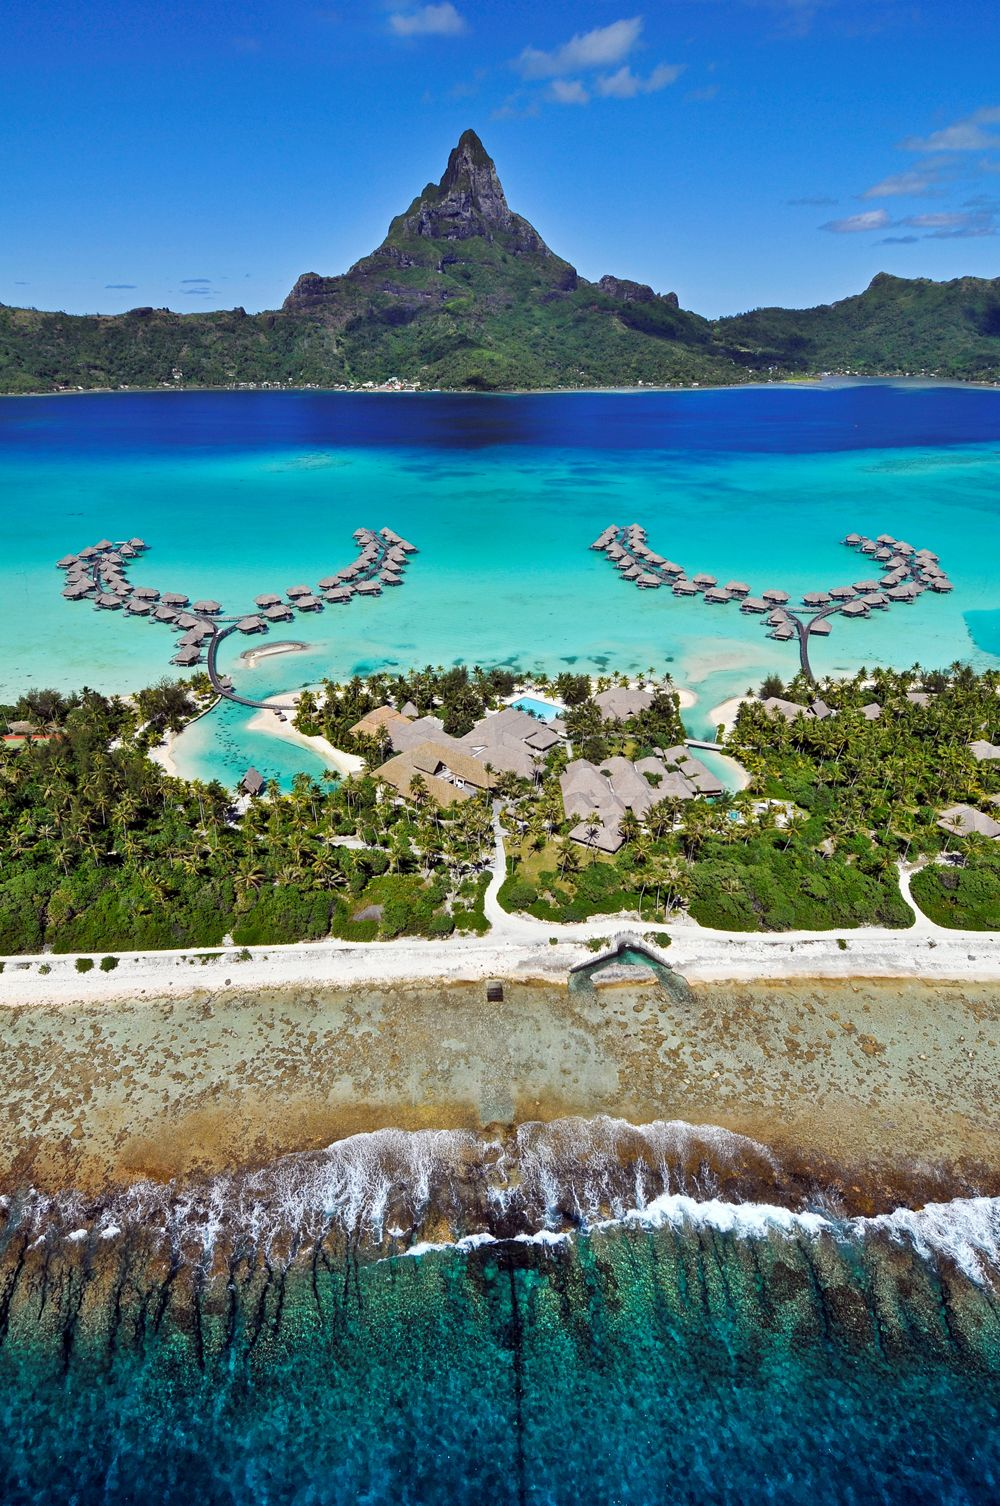 InterContinental Thalasso Bora Bora-Society Islands